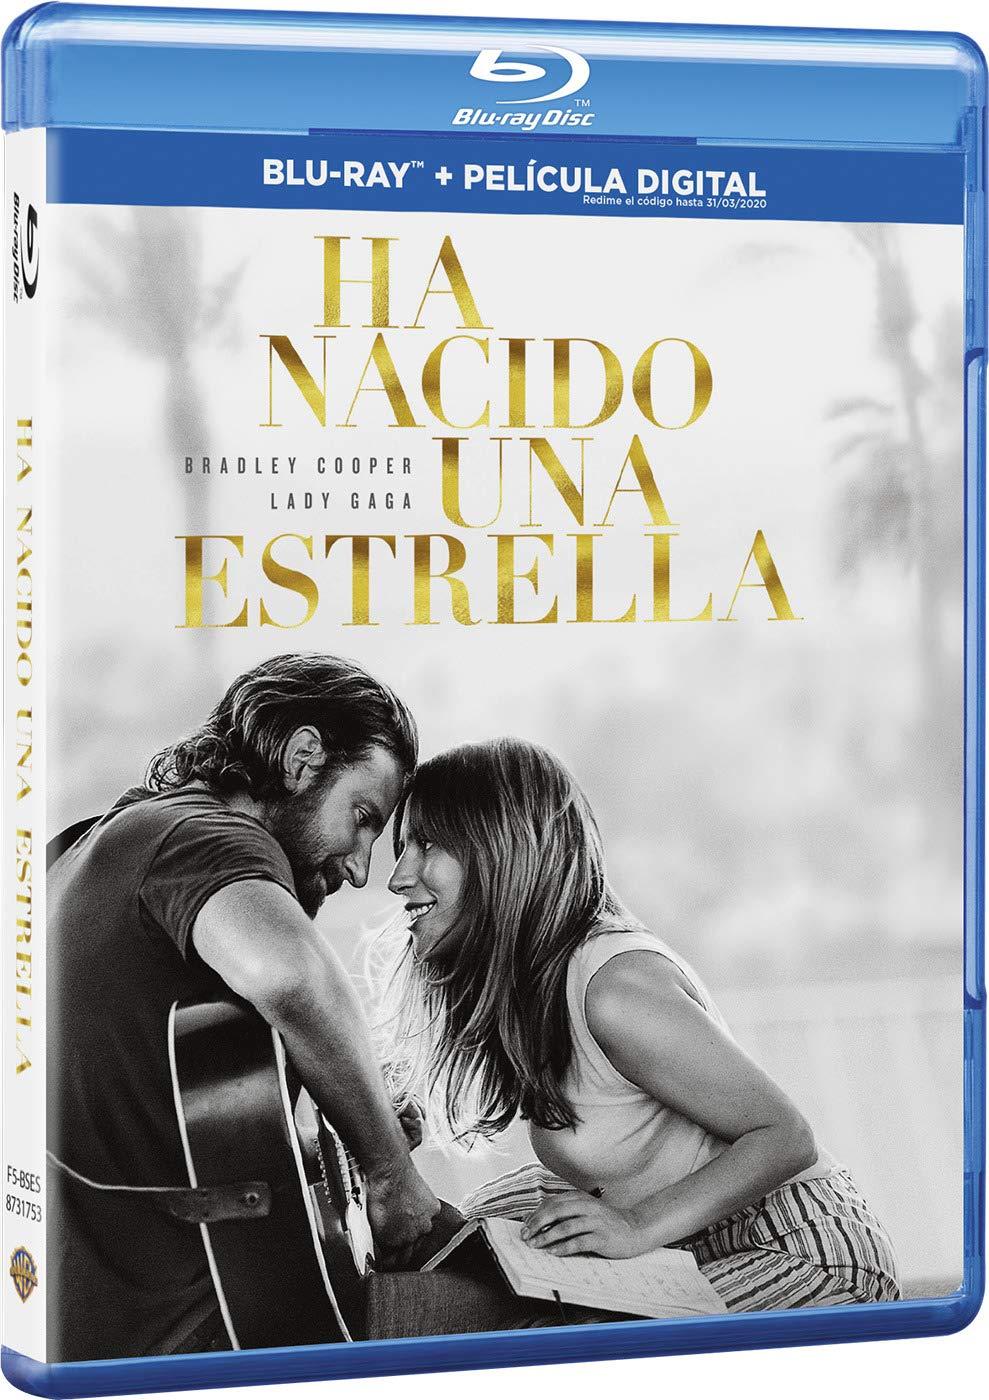 Ha Nacido Una Estrella Blu Ray Blu Ray Amazon Es Bradley Cooper Lady Gaga Bradley Cooper Bradley Cooper Lady Gaga Cine Y Series Tv